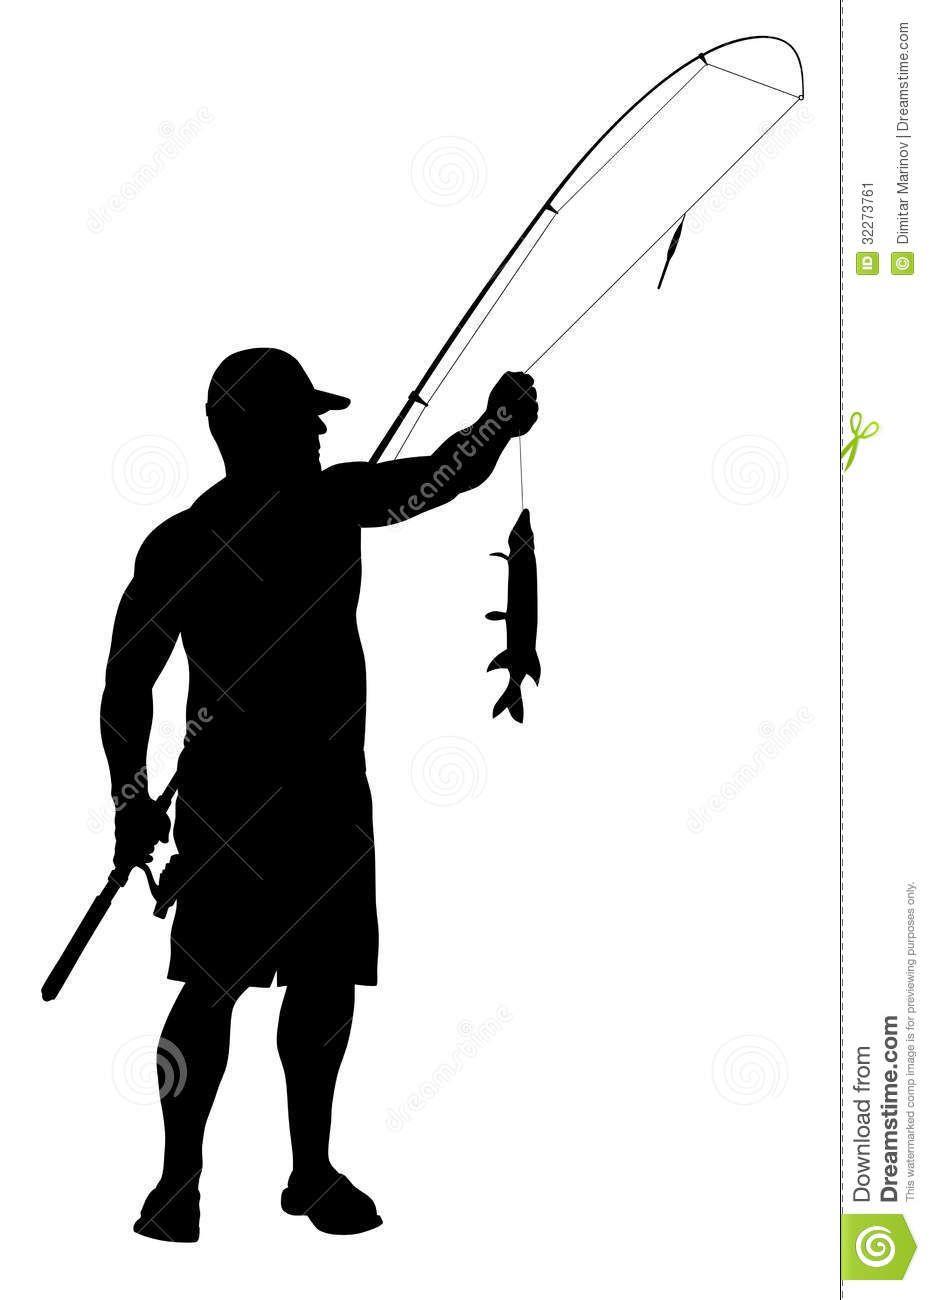 Man Fishing Silhouette.